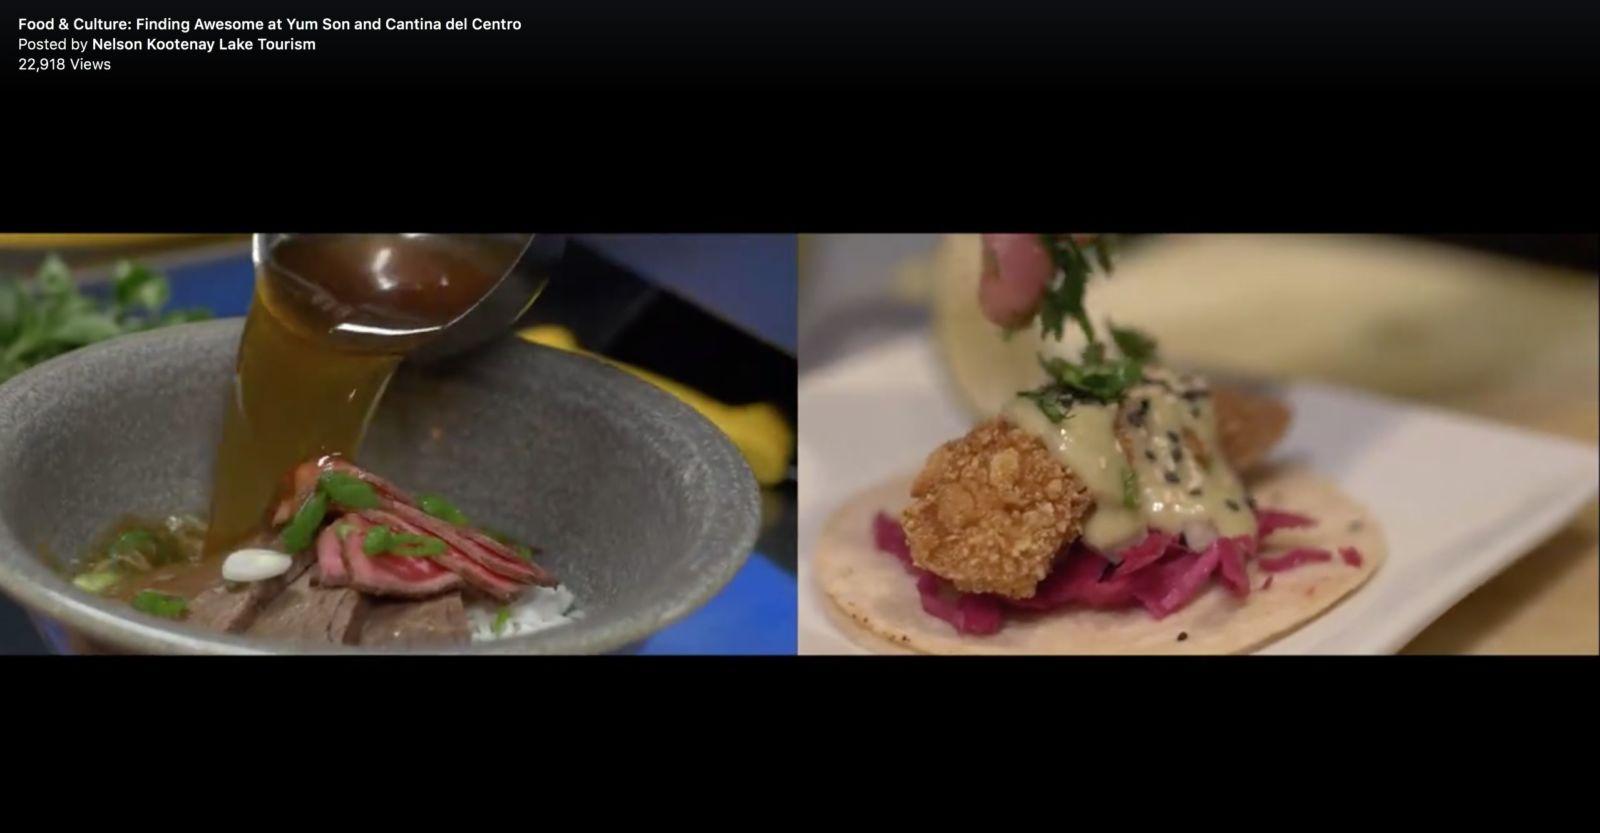 Culinary Culture at Yum Son and Cantina Del Centro